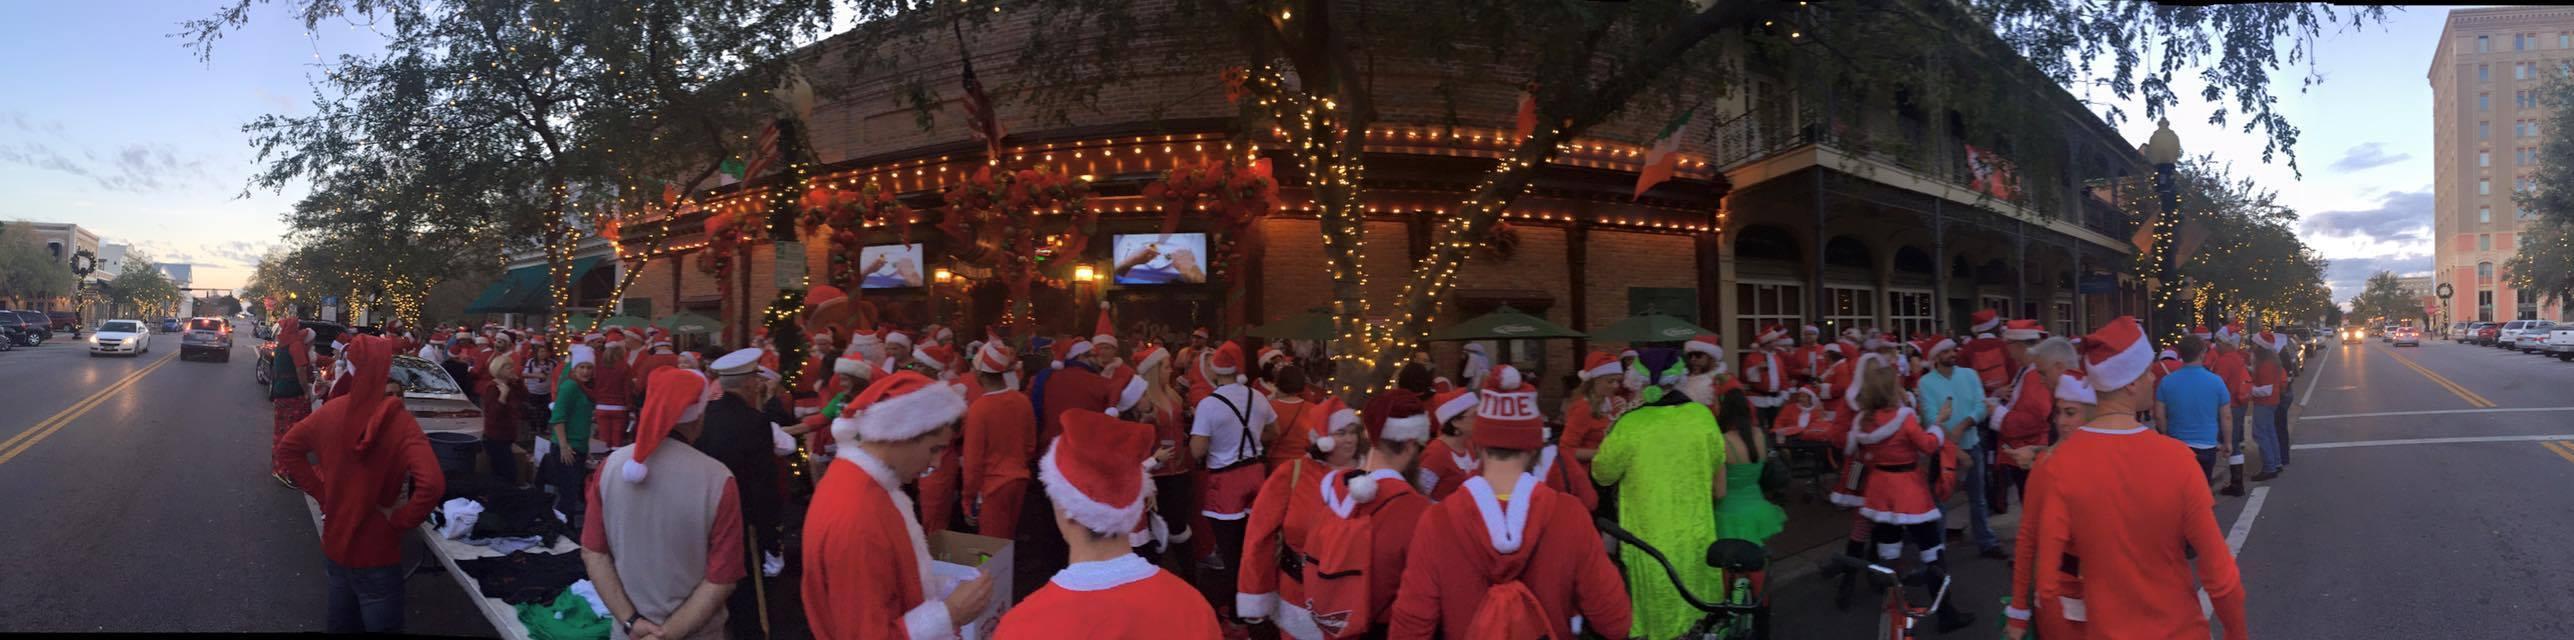 Santa Pub Crawl 2016